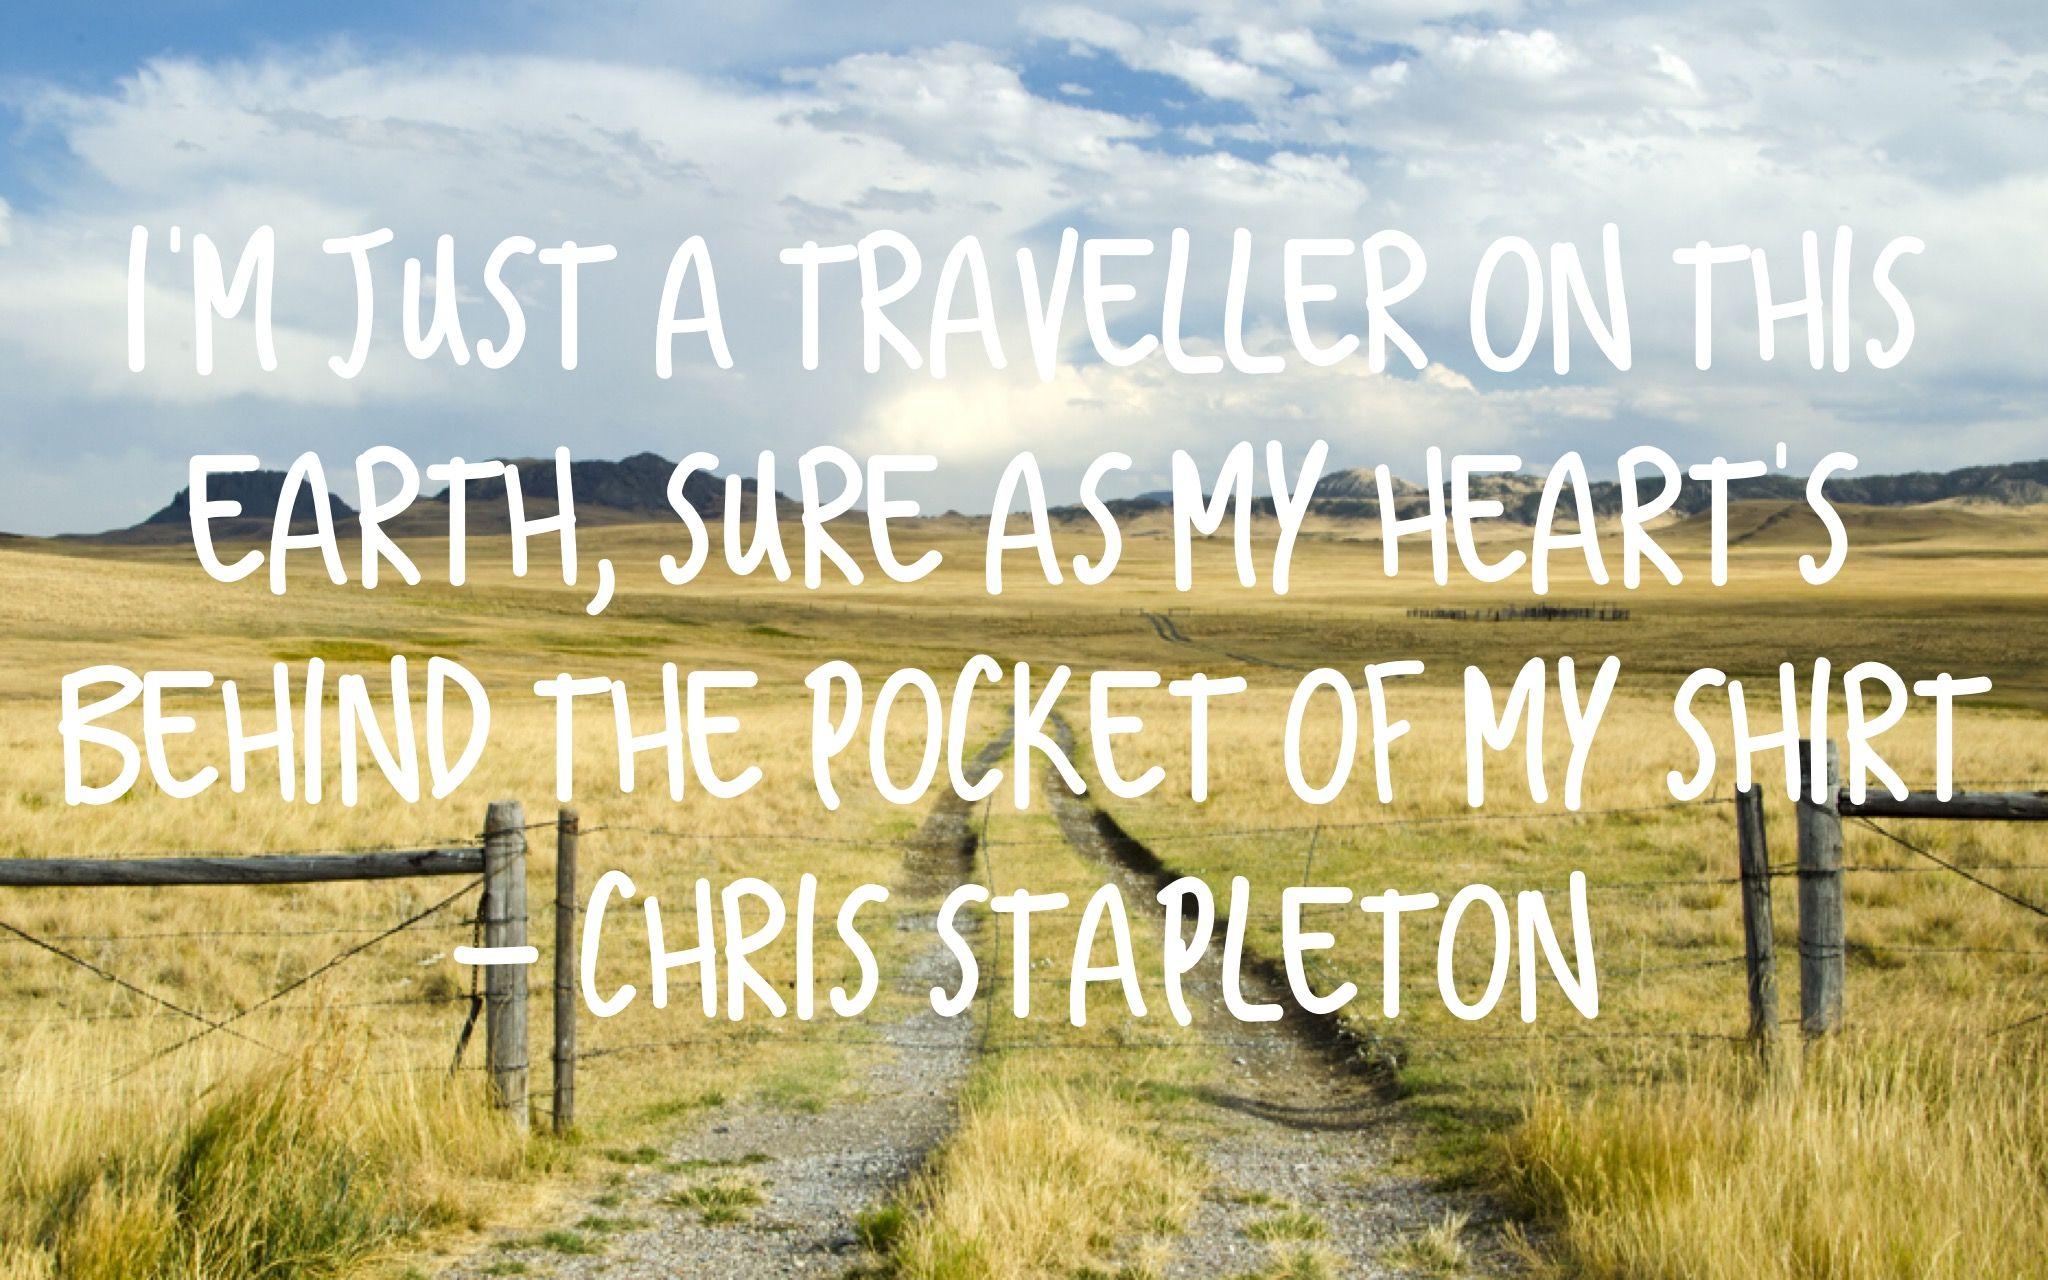 Chris Stapleton - Traveller | Country music quotes, Chris ...